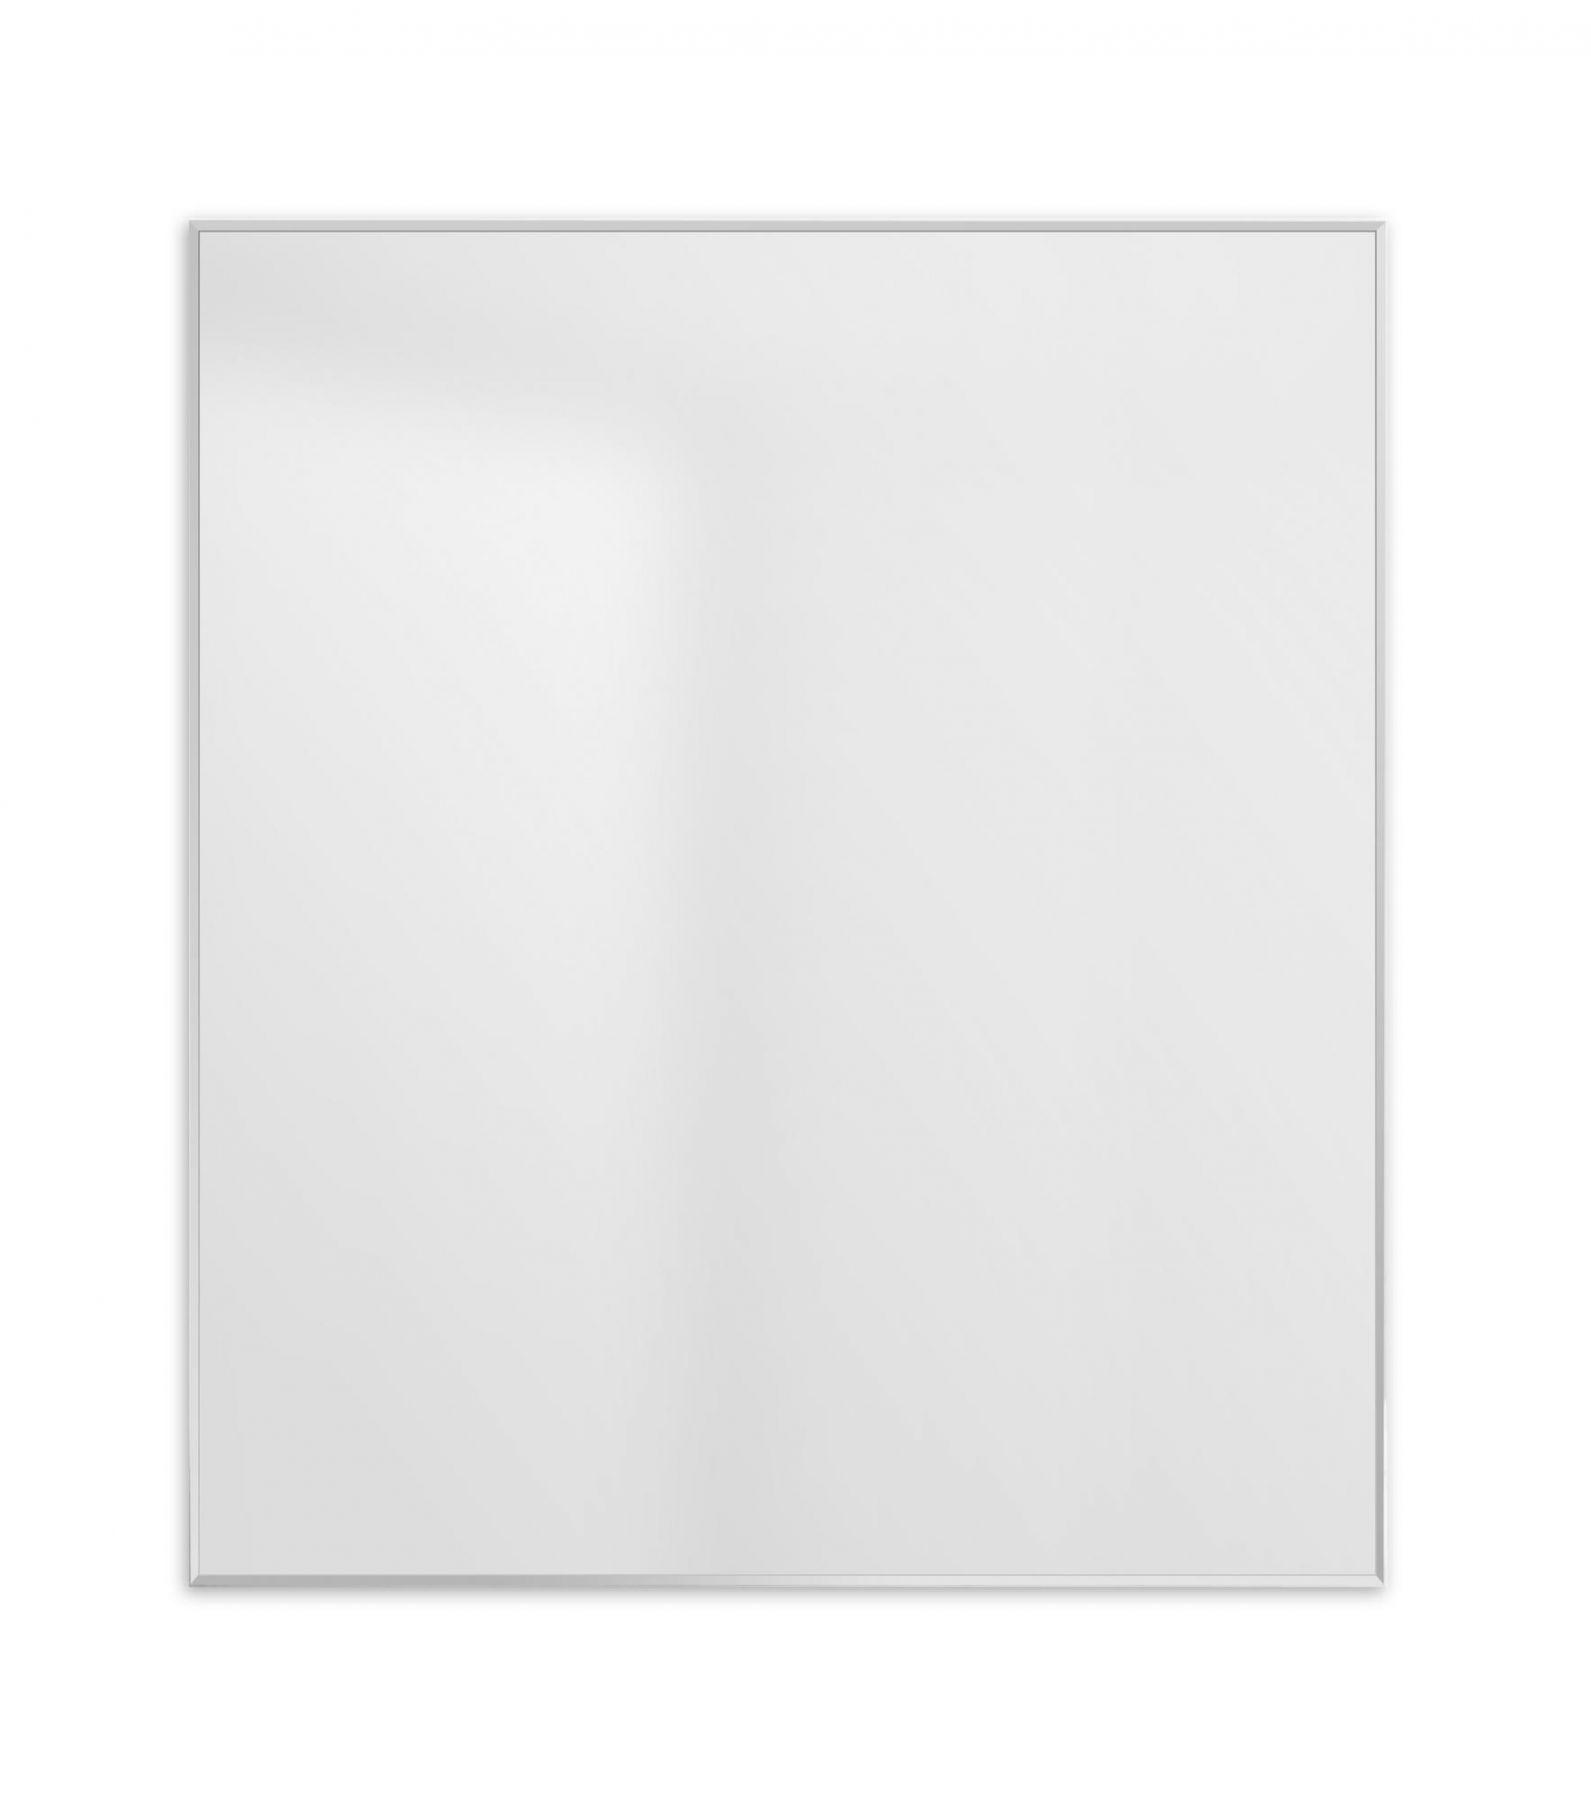 Зеркало для ванной BelBagno SPC-AL-700-800 ФОТО